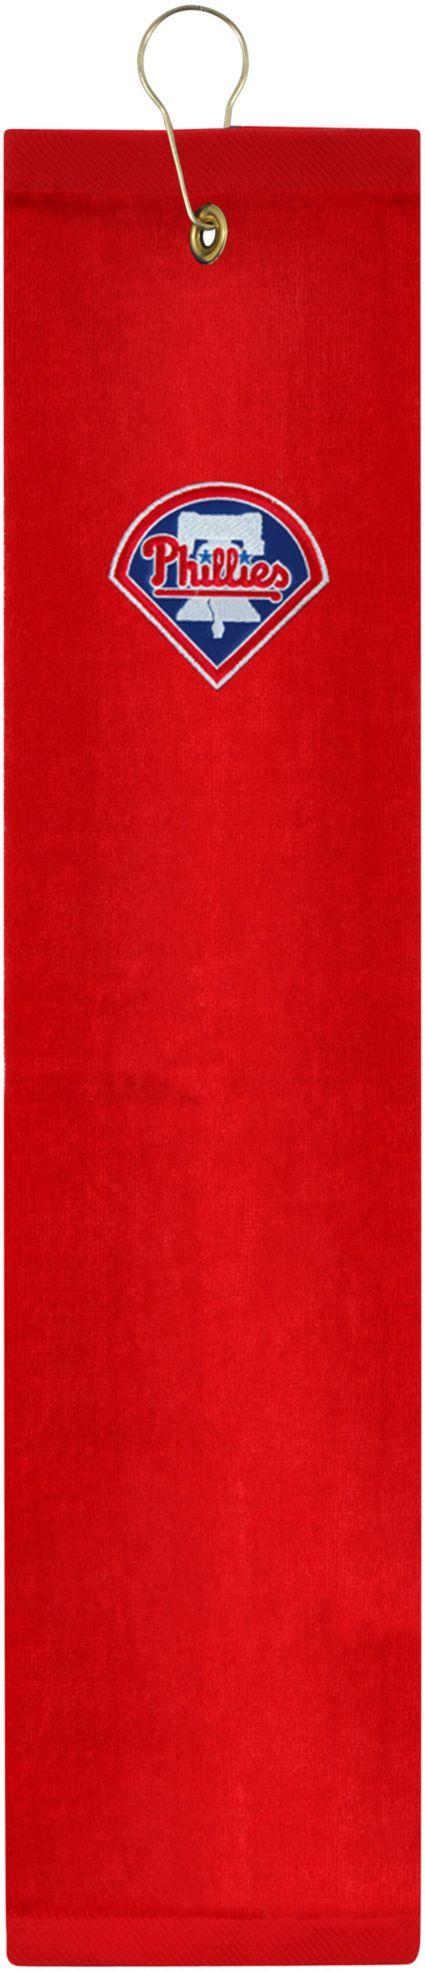 McArthur Sports Philadelphia Phillies Embroidered Tri-Fold Towel